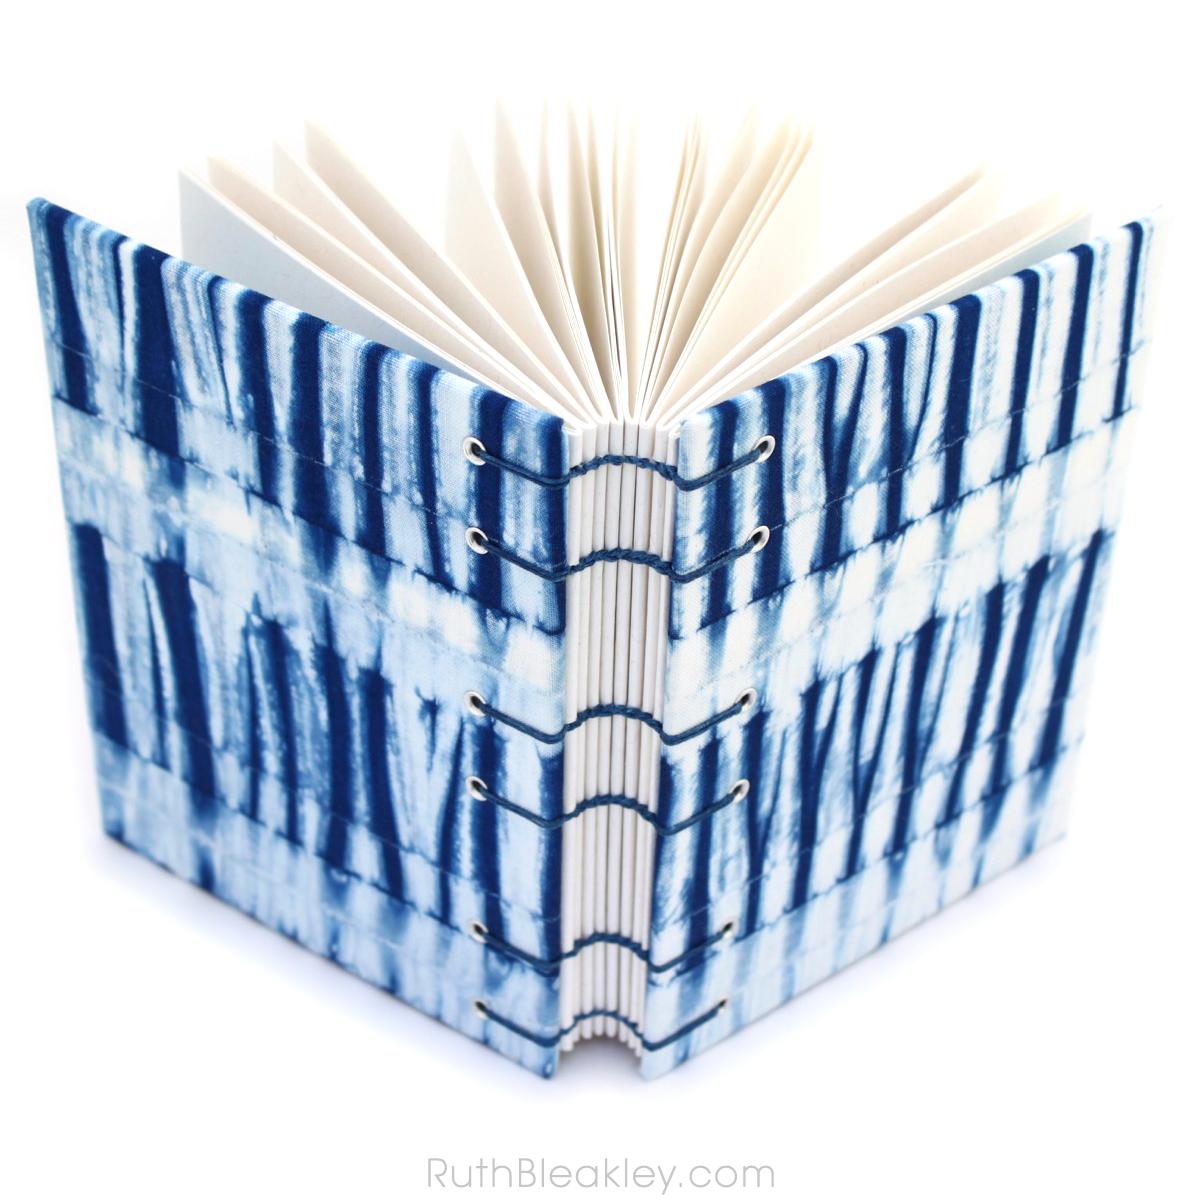 Indigo Shibori Journal handmade by book artist Ruth Bleakley with fabric from Cape Cod Shibori - 6